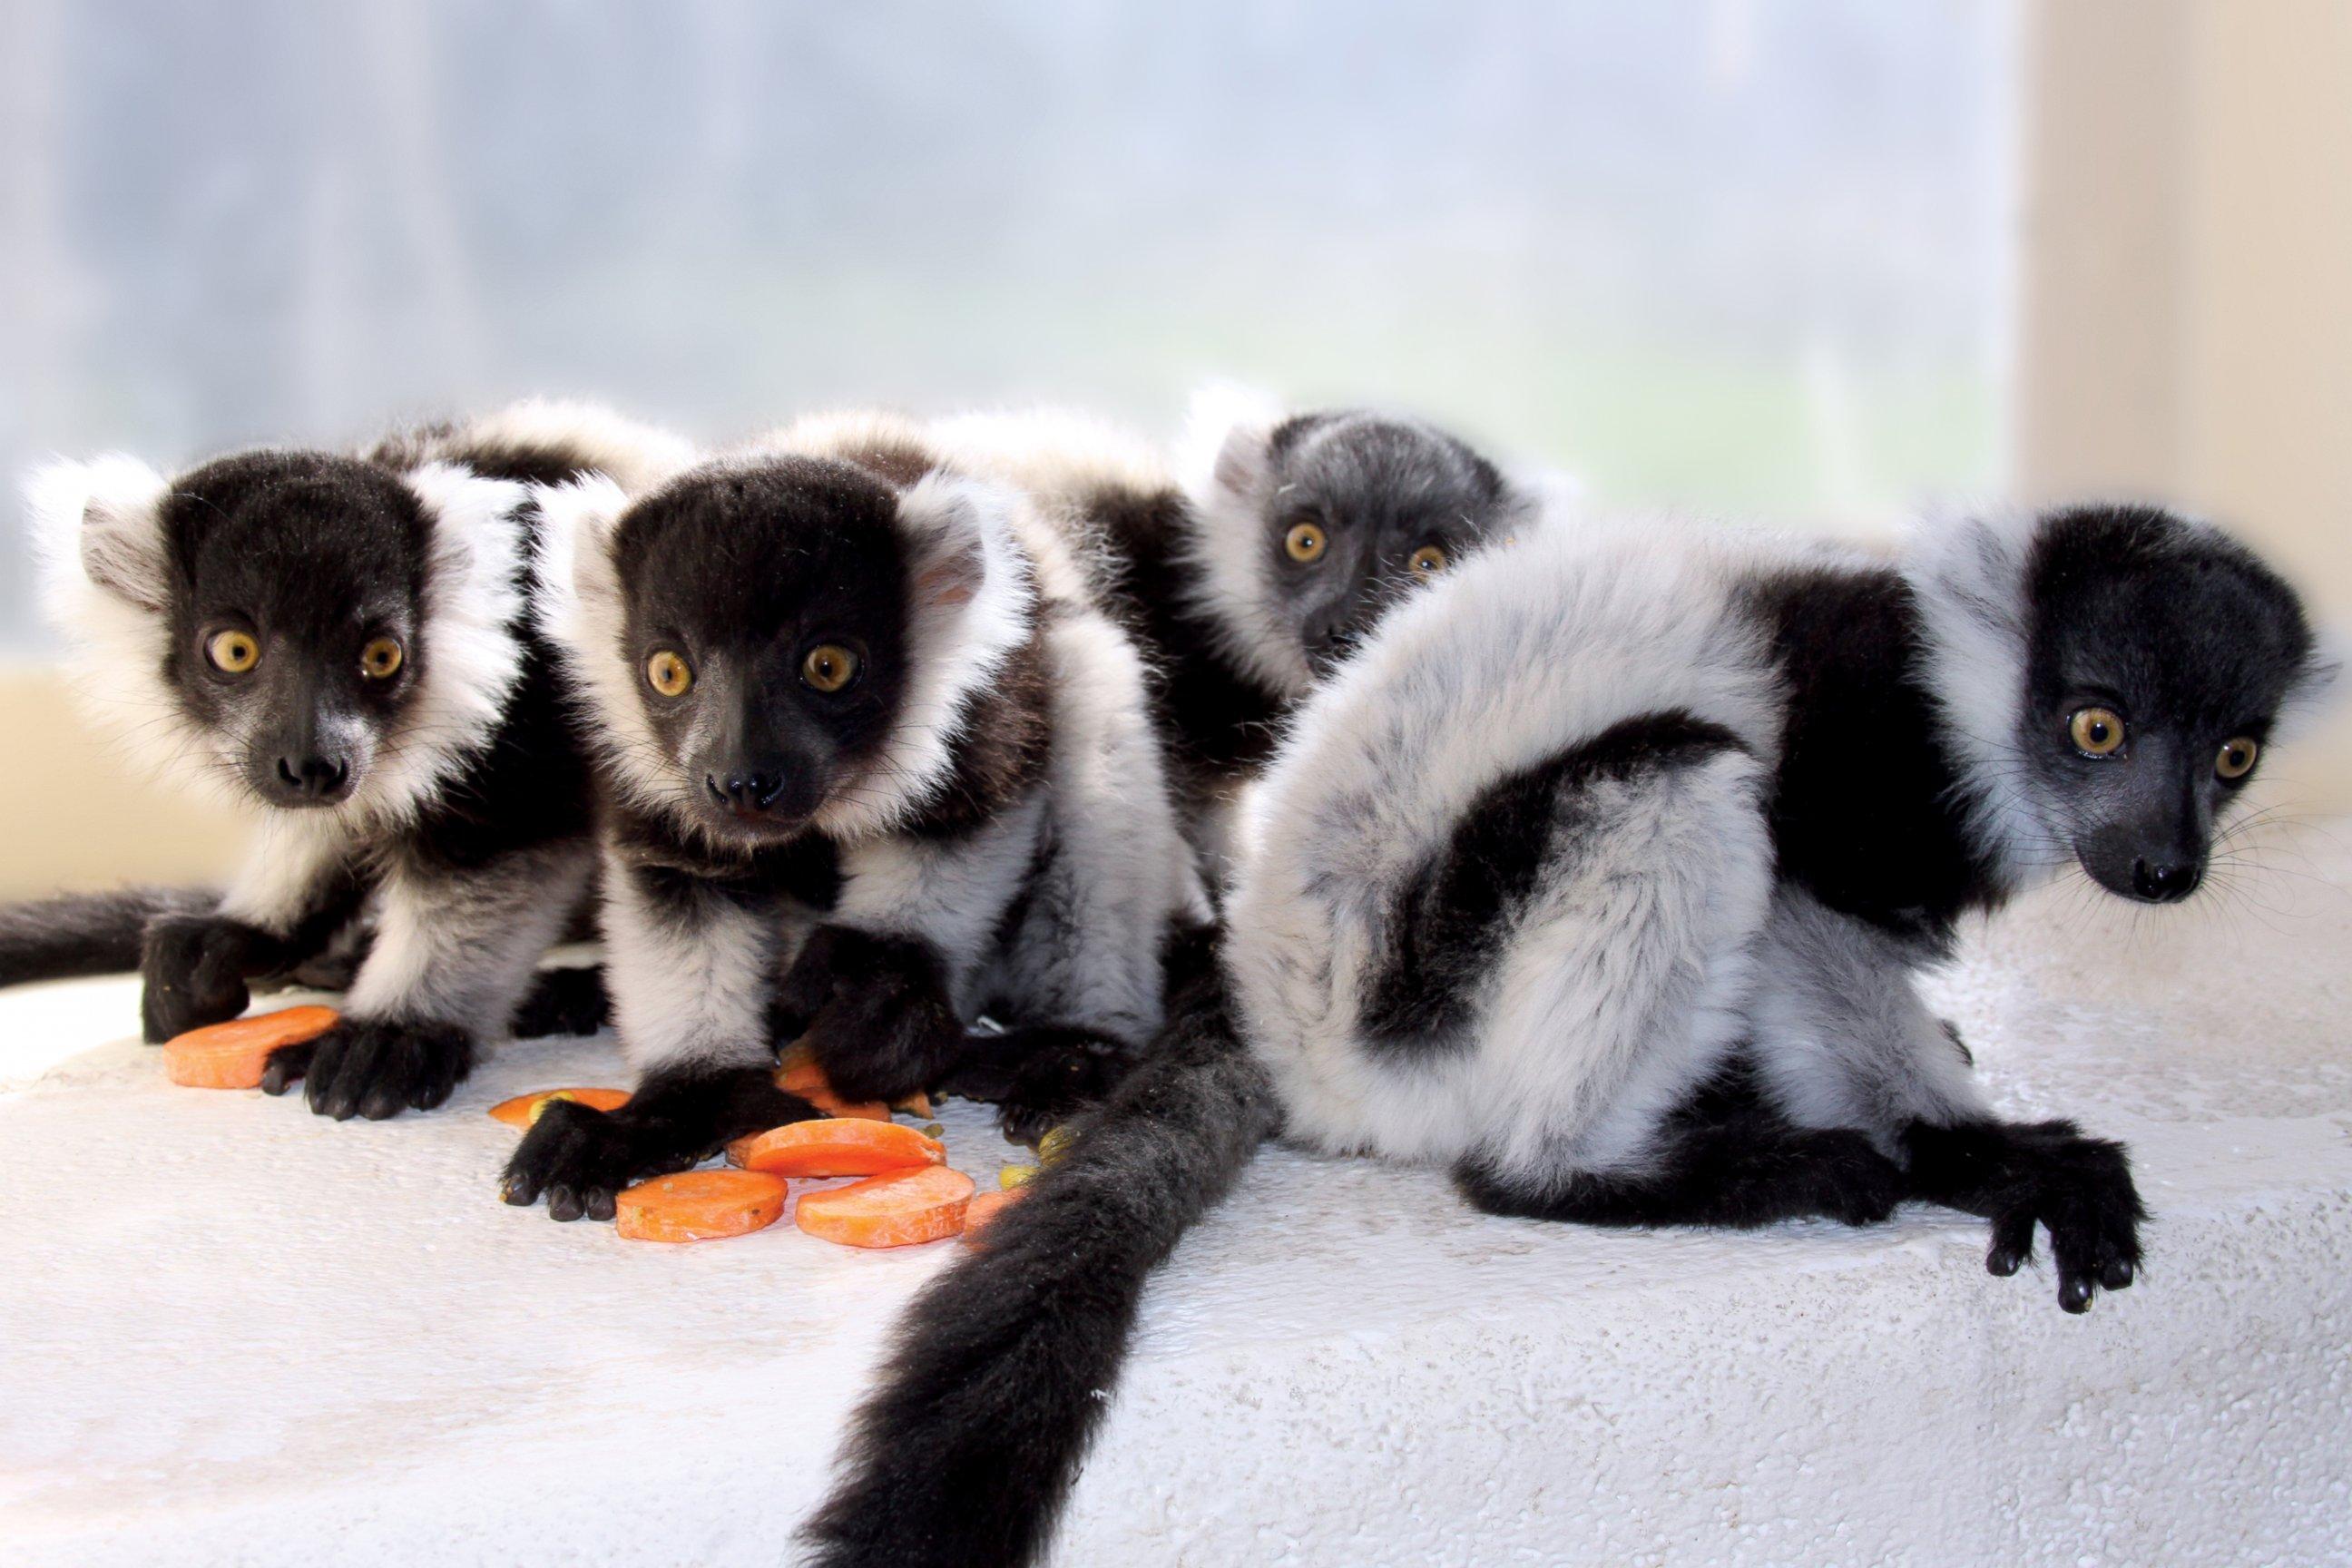 4 Baby Lemurs Make Their Debut at Philadelphia Zoo